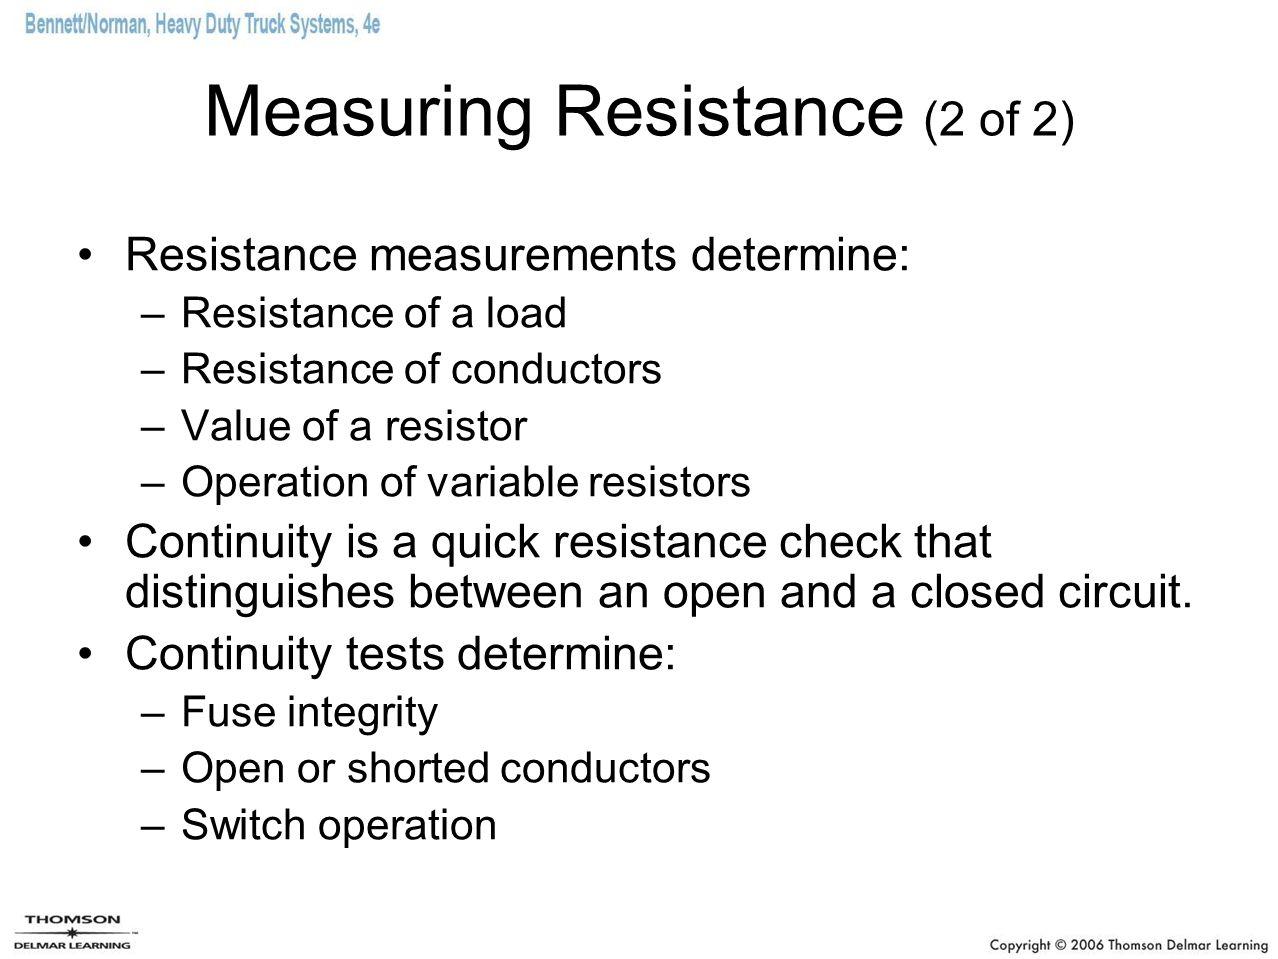 Measuring Resistance (2 of 2)